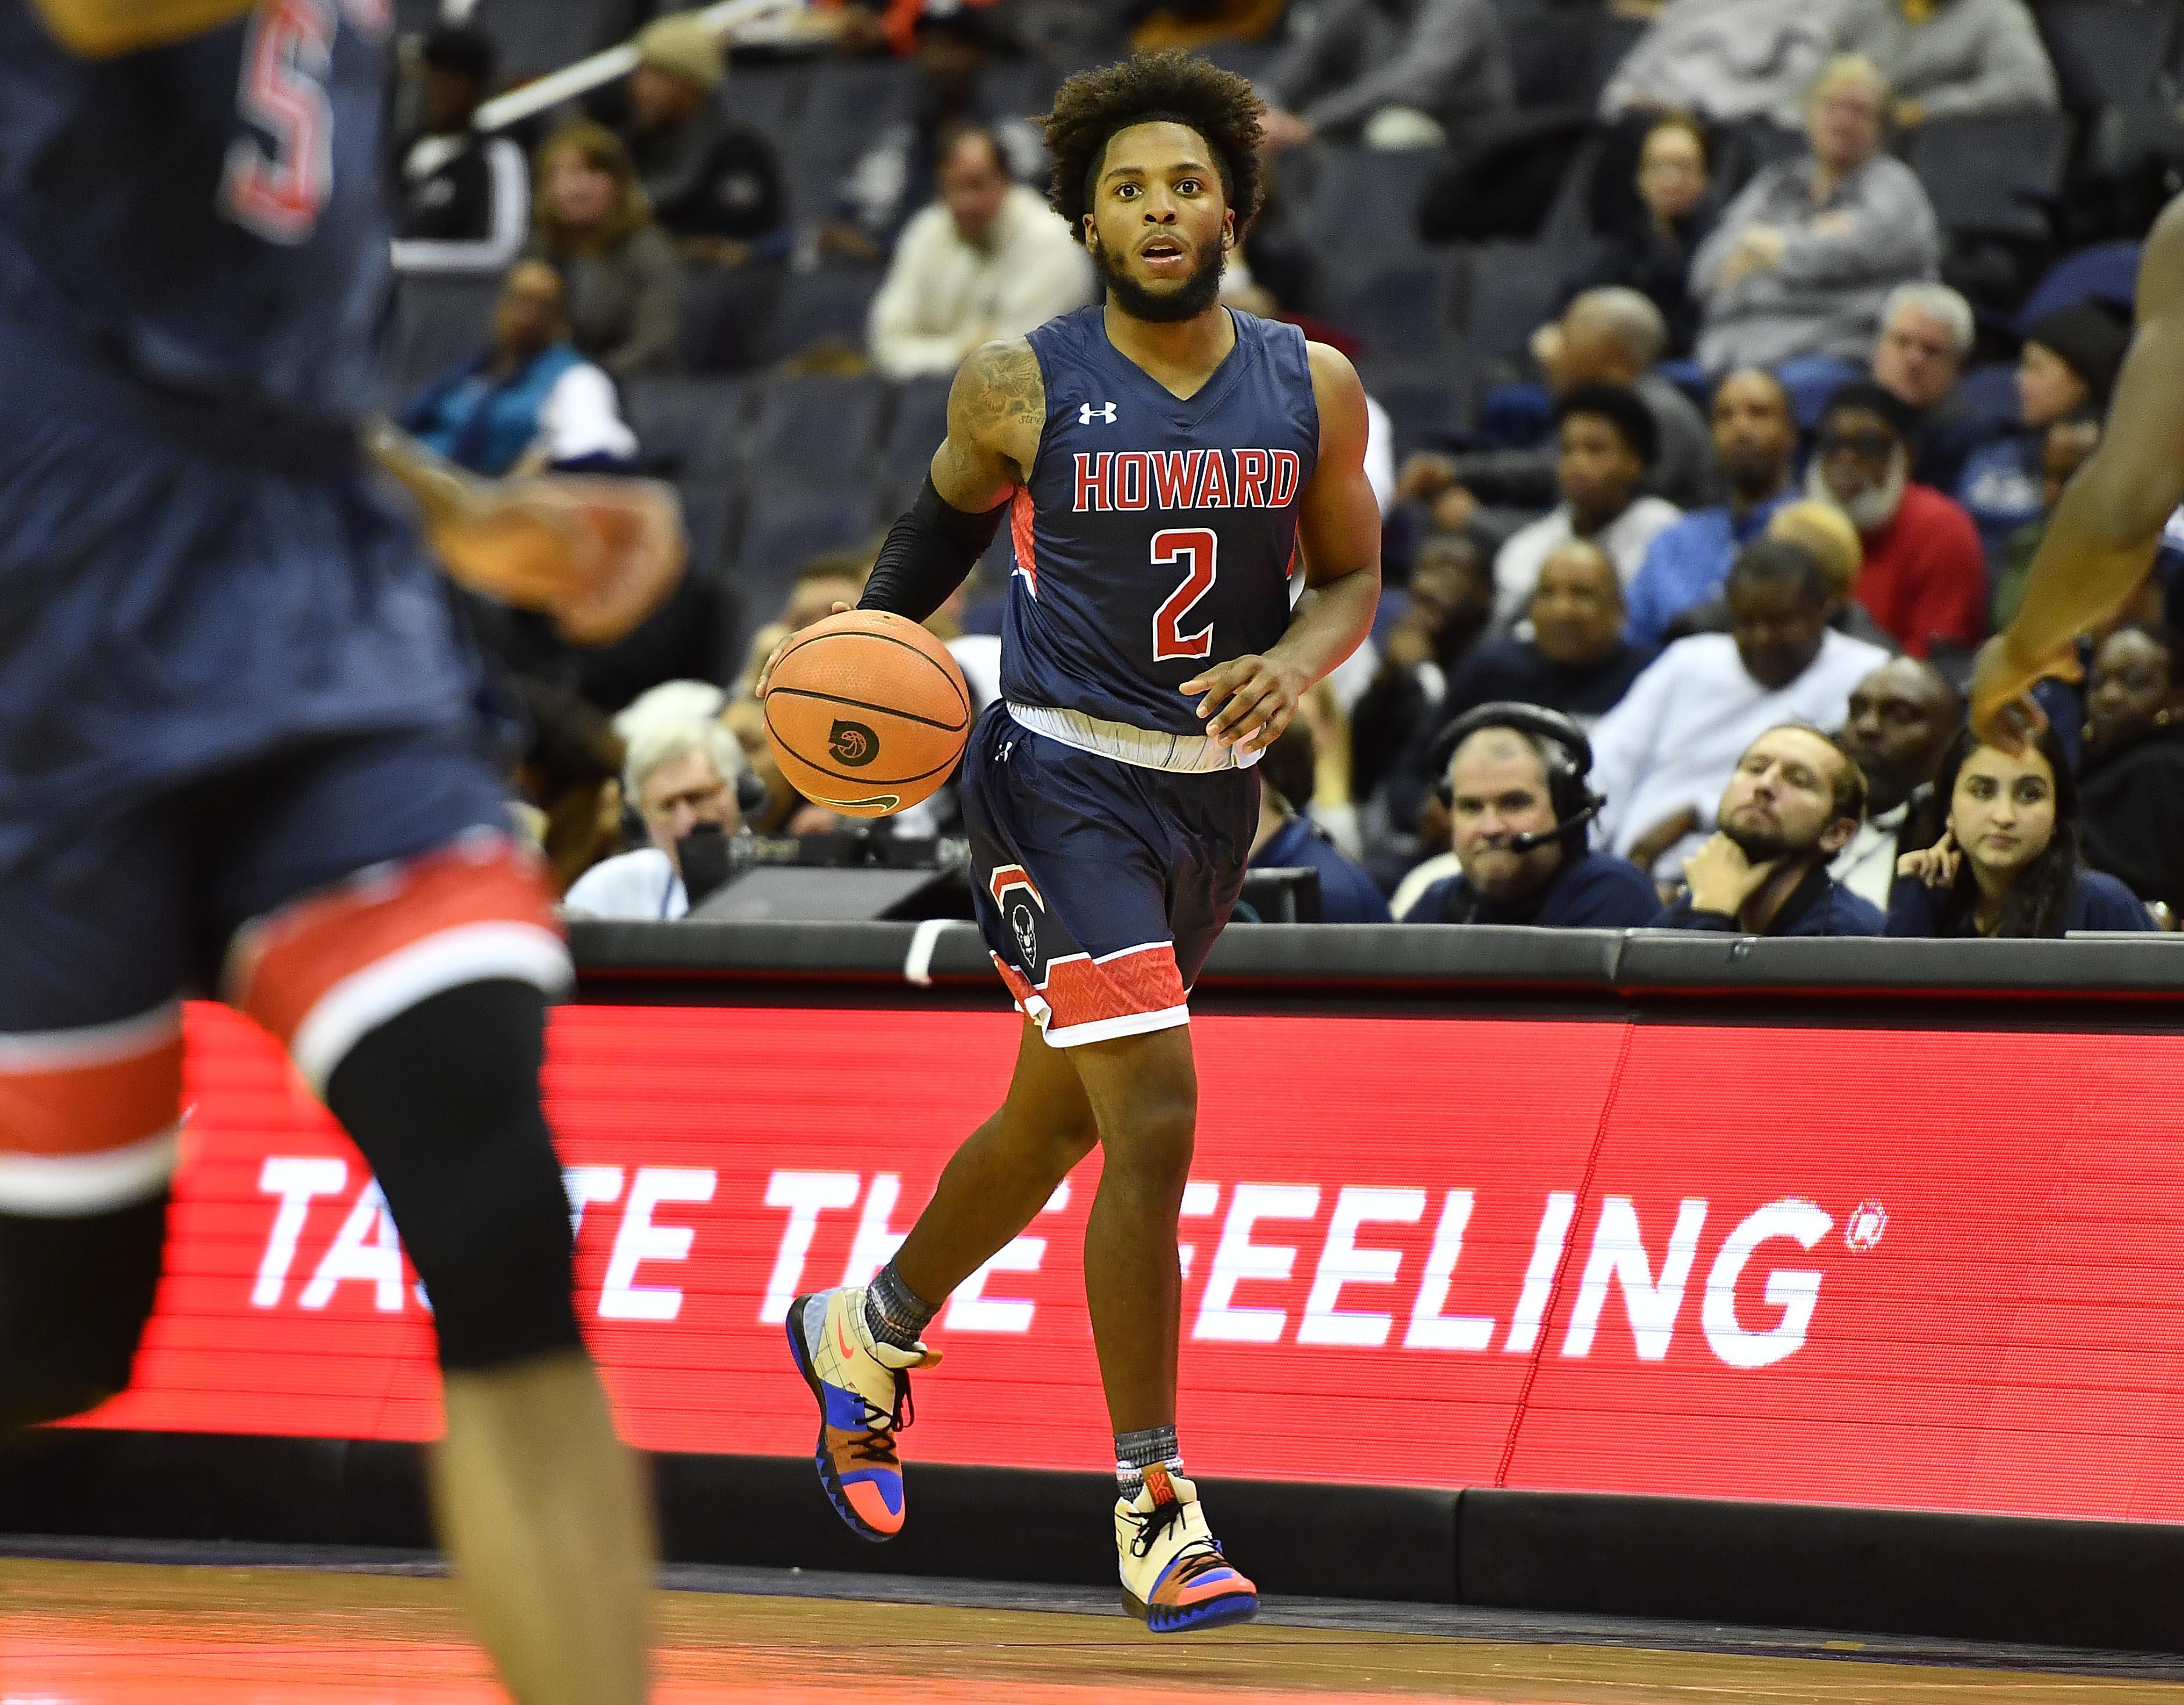 NCAA Basketball: Howard at Georgetown